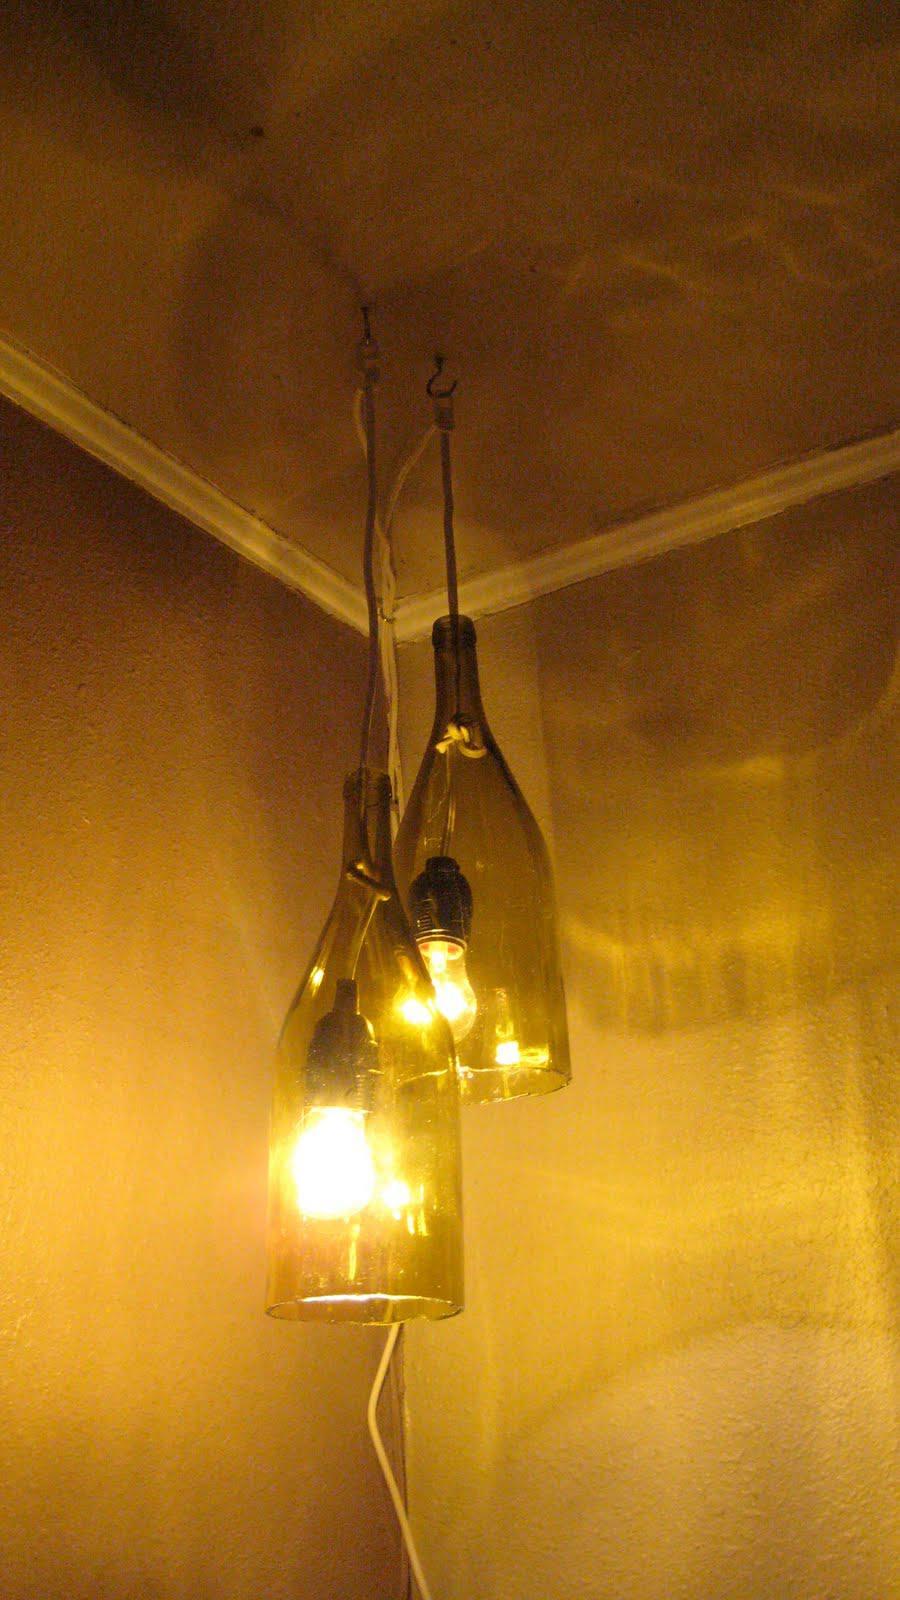 12 diy pendant light fixtures from upcycled items diy wine bottle pendant light aloadofball Choice Image